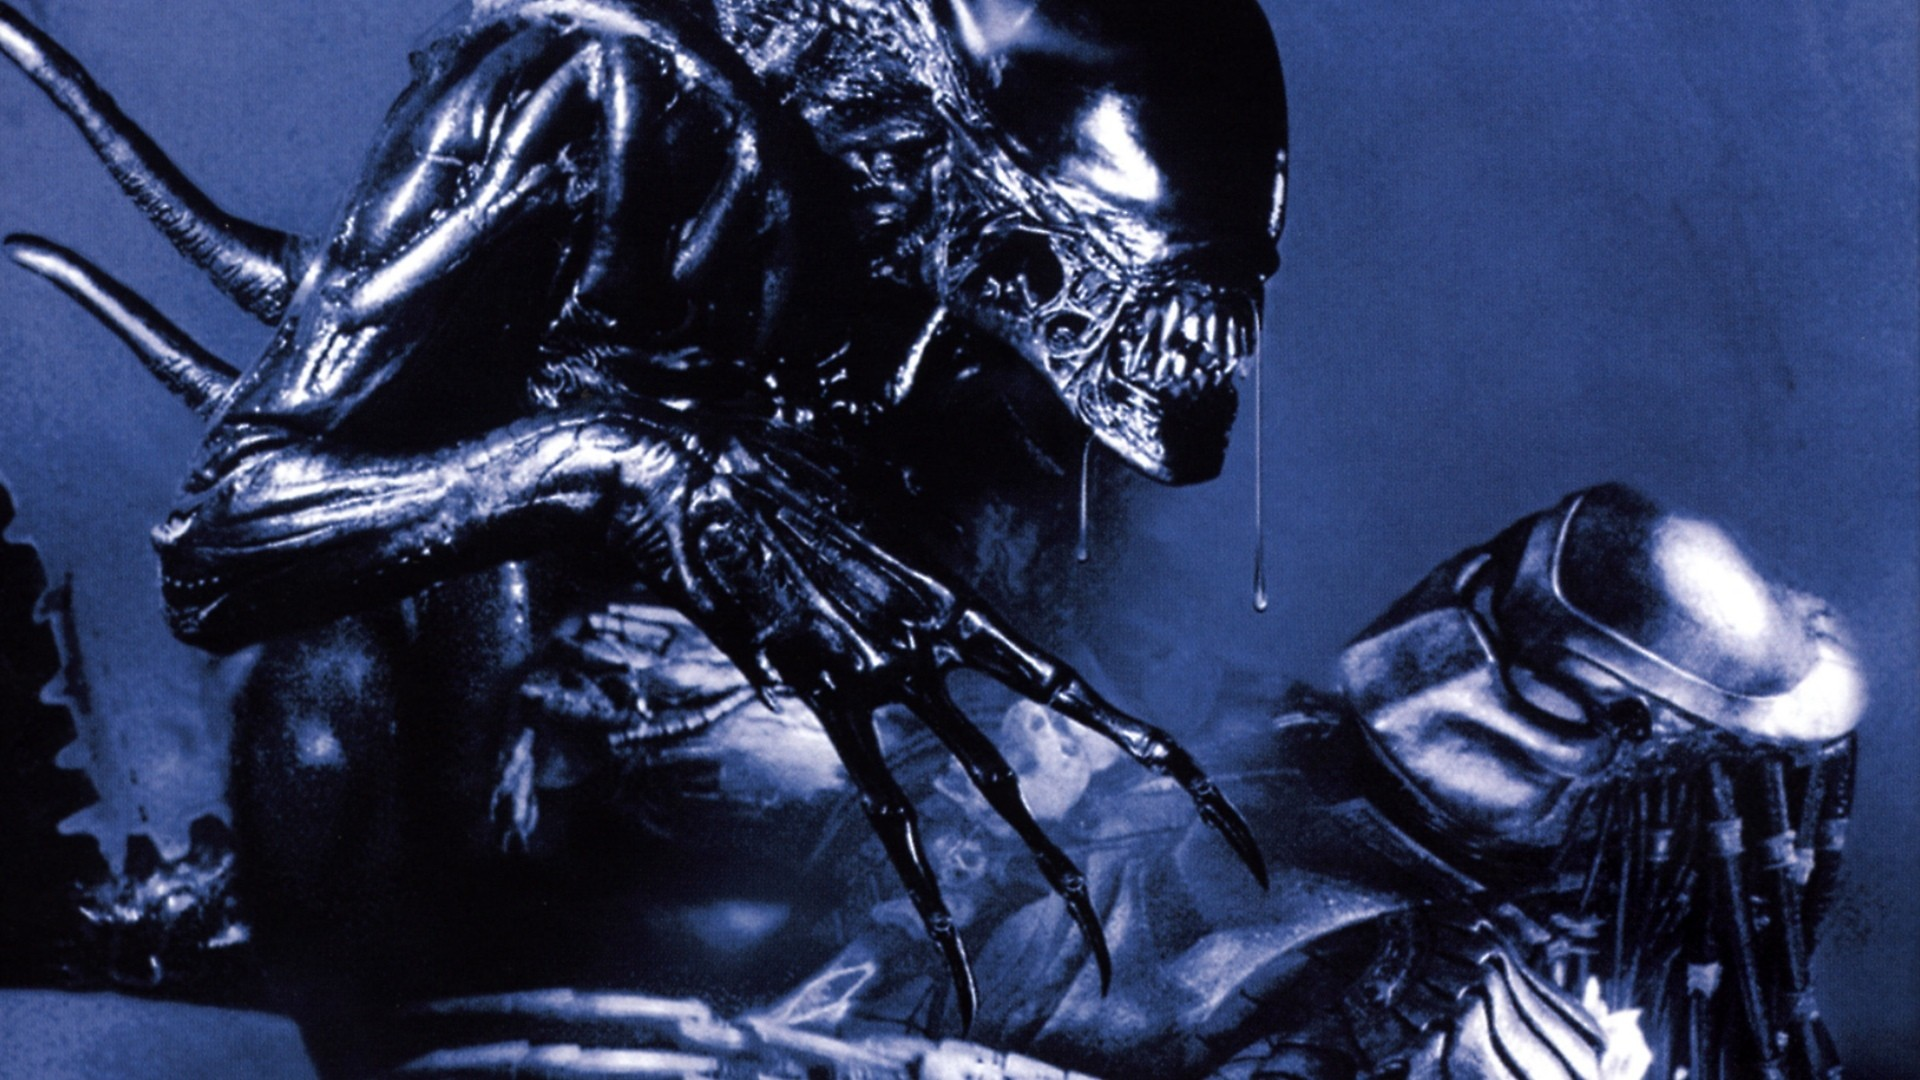 Alien Vs Predator Hd Wallpaper Background Image 1920x1080